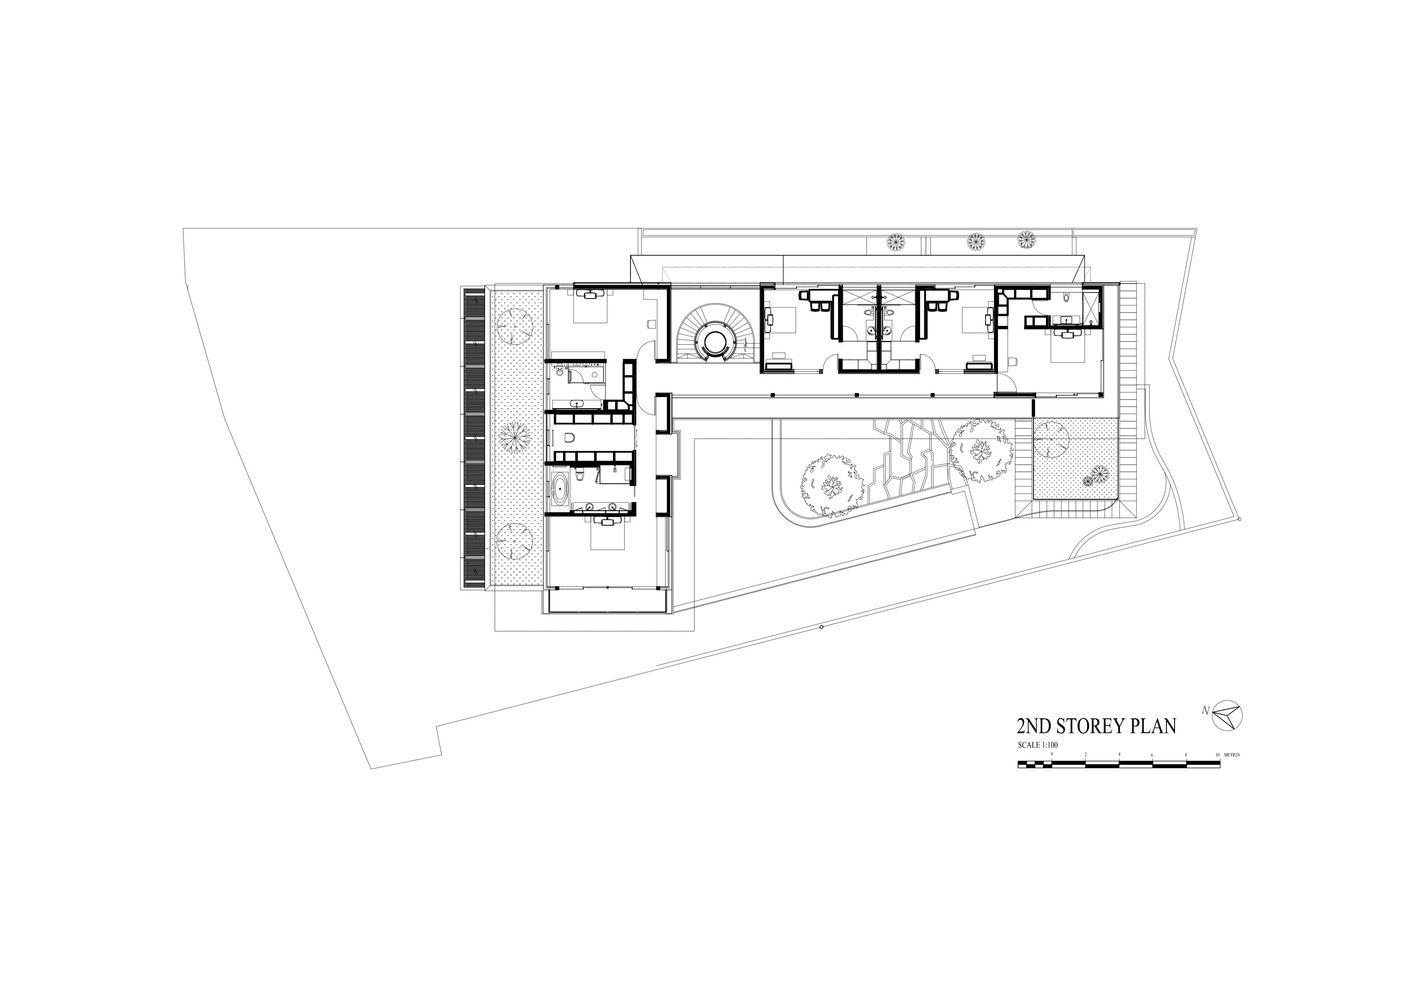 Gallery Of Botanica House Guz Architects 12 Architect Botanica How To Plan